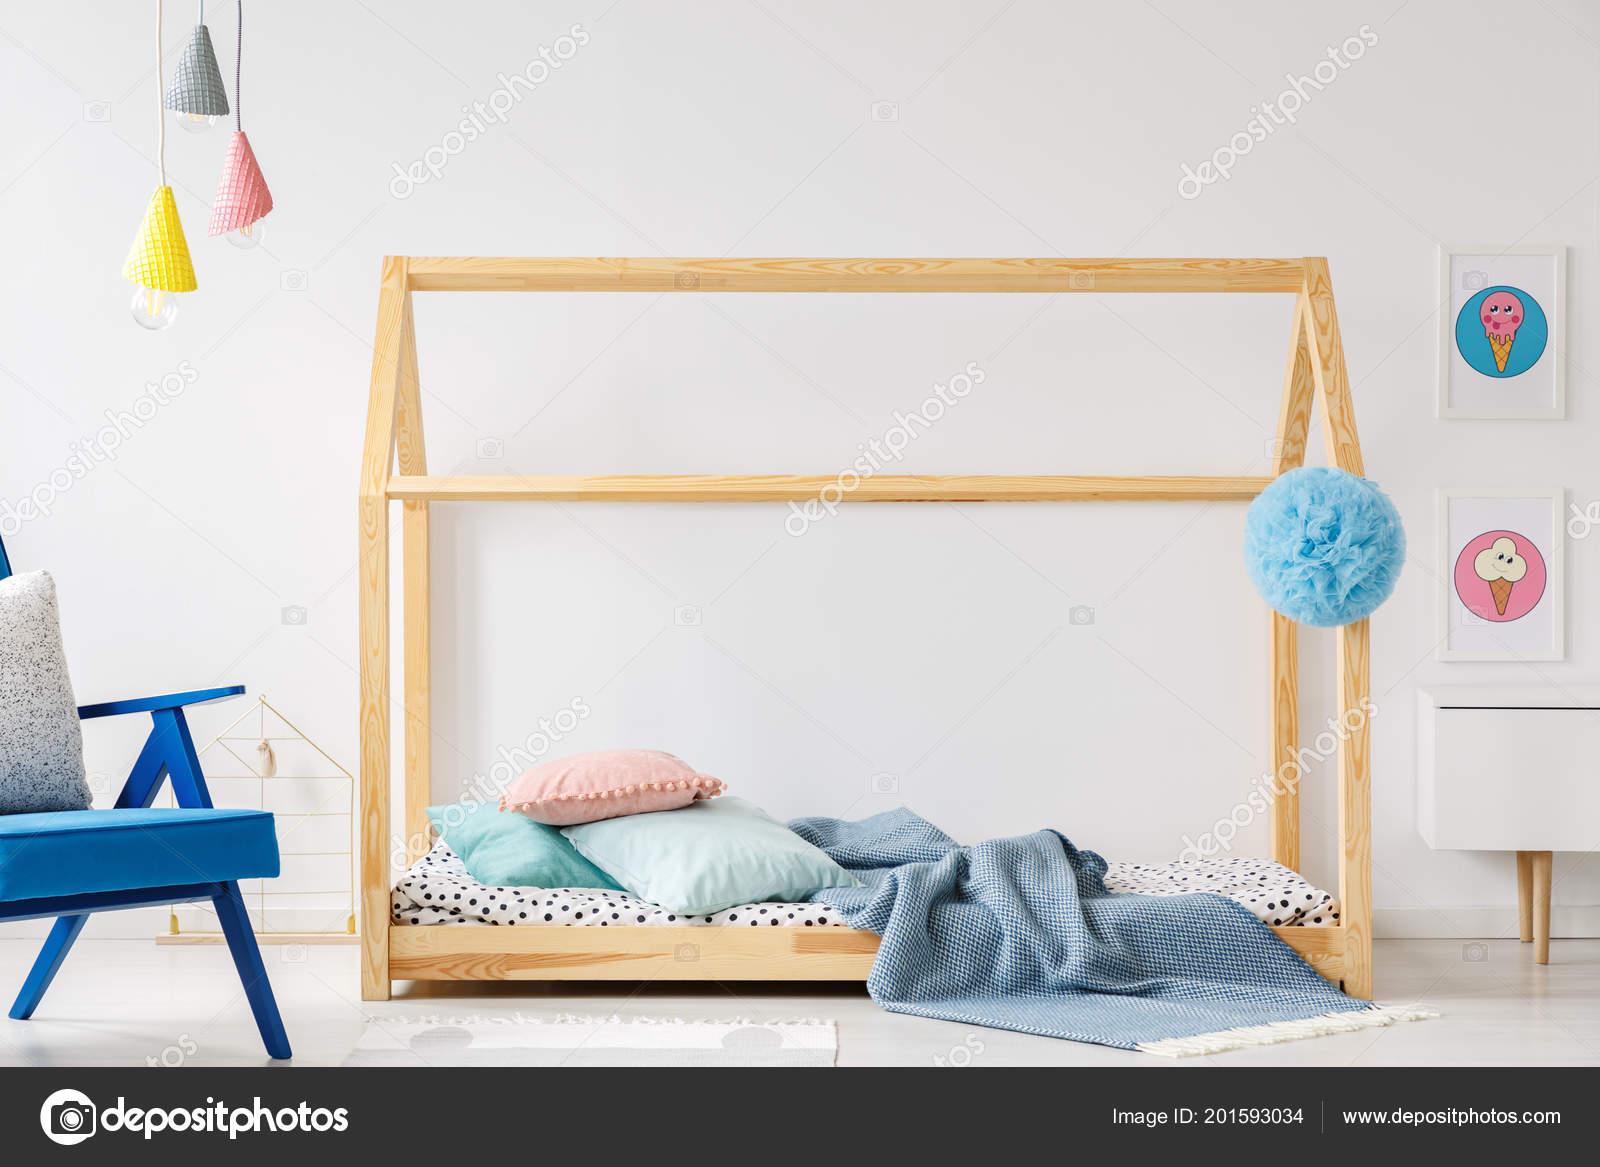 3f14866b5d4 Ξύλινο Diy Κρεβάτι Μοντέρνο Παιδικό Υπνοδωμάτιο Εσωτερικό Μπλε Πολυθρόνα  Και — Φωτογραφία Αρχείου